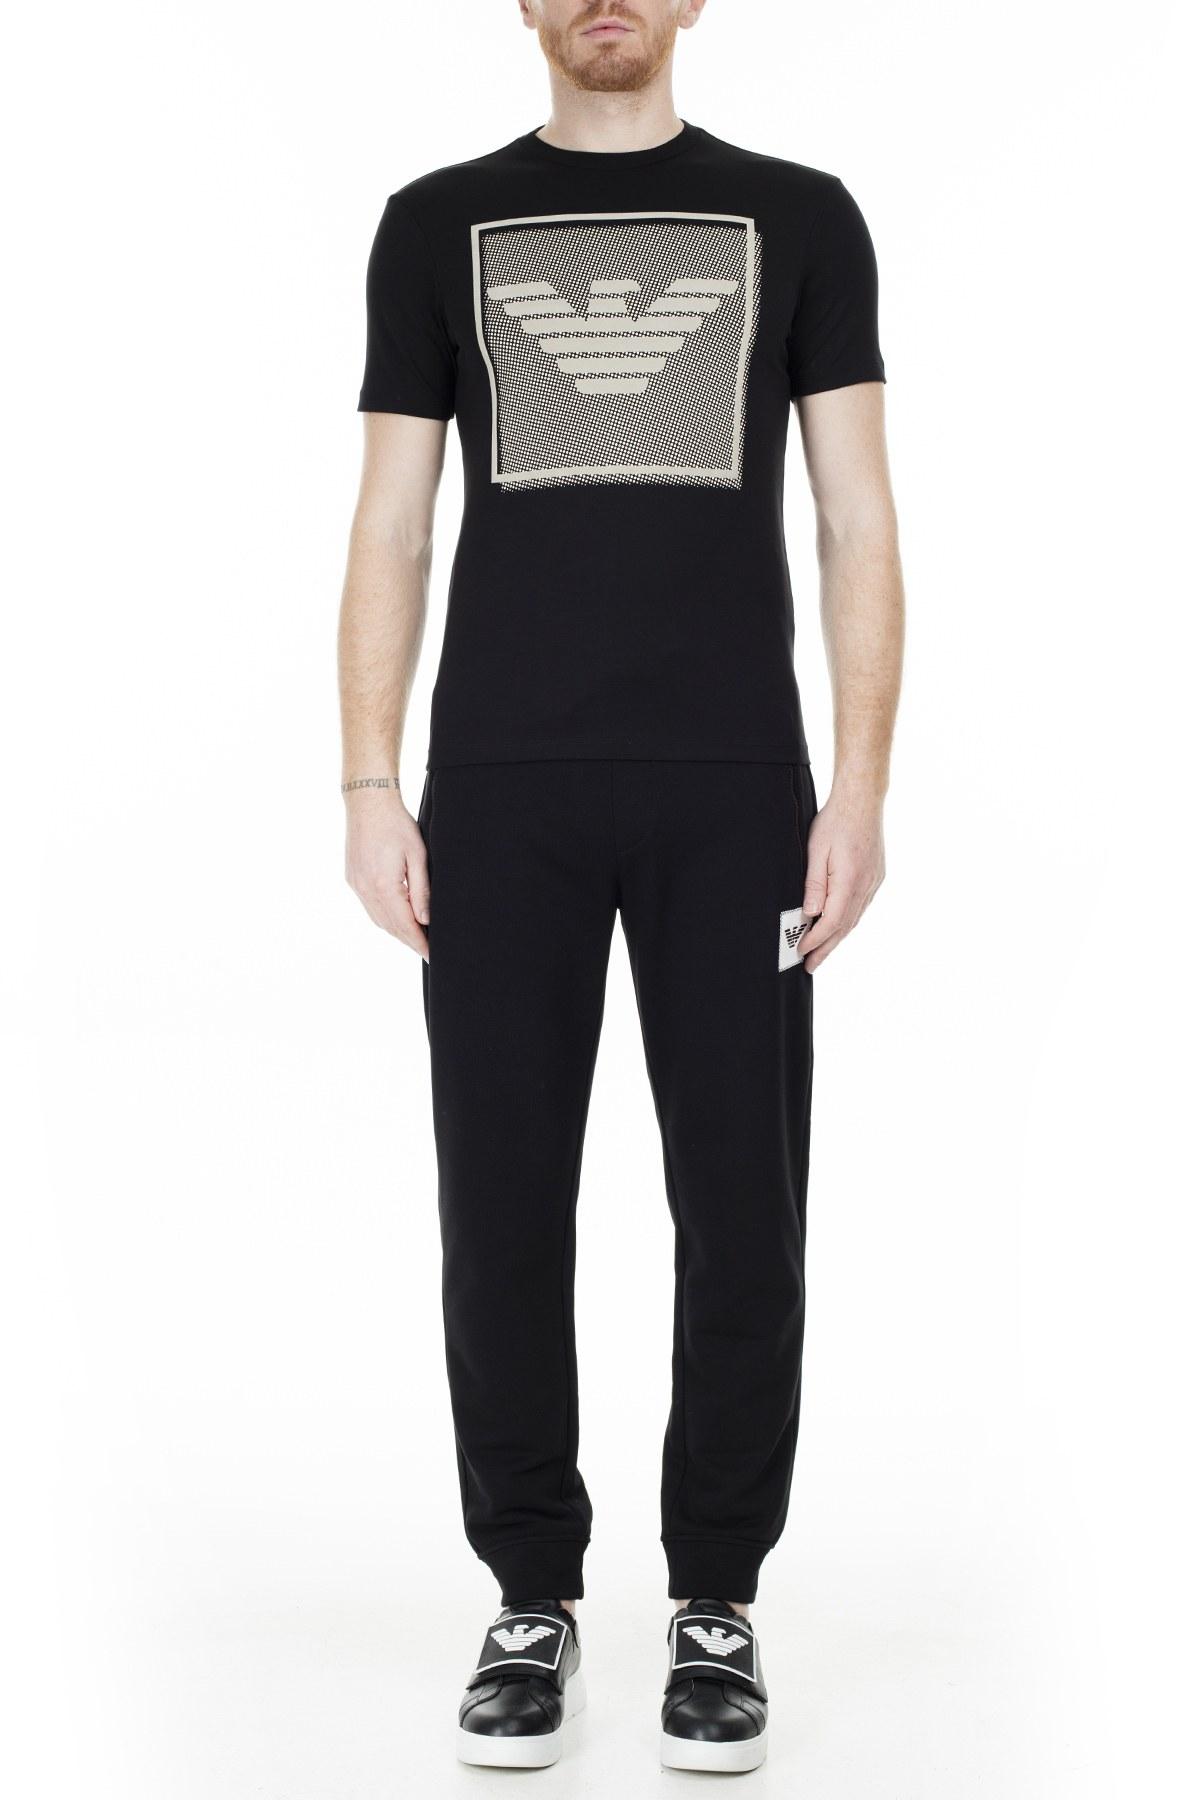 Emporio Armani Erkek T Shirt S 6G1TF5 1JPRZ 0999 SİYAH